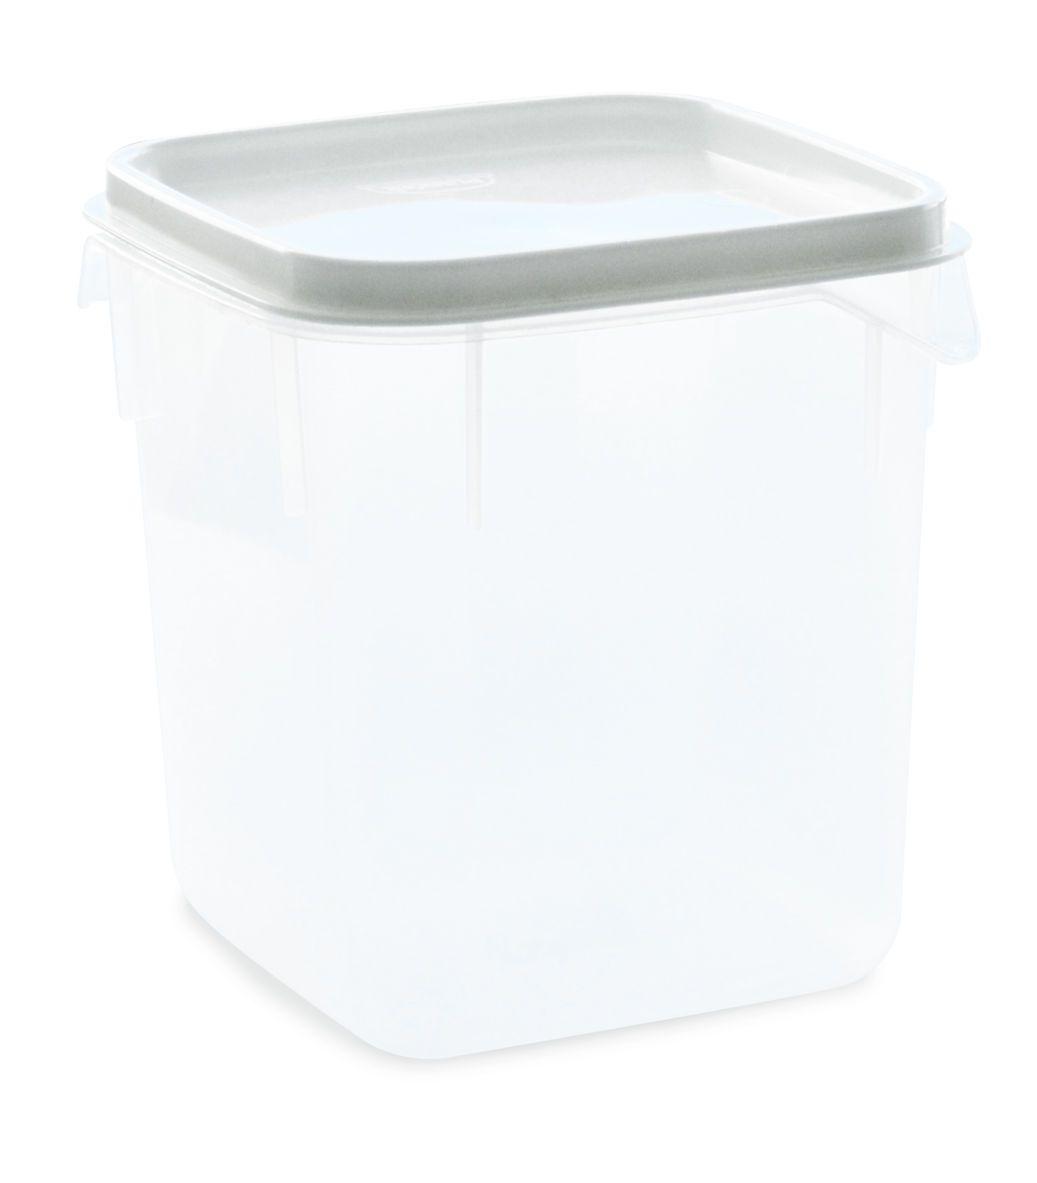 Pote 1,7 L Plástico Moduline